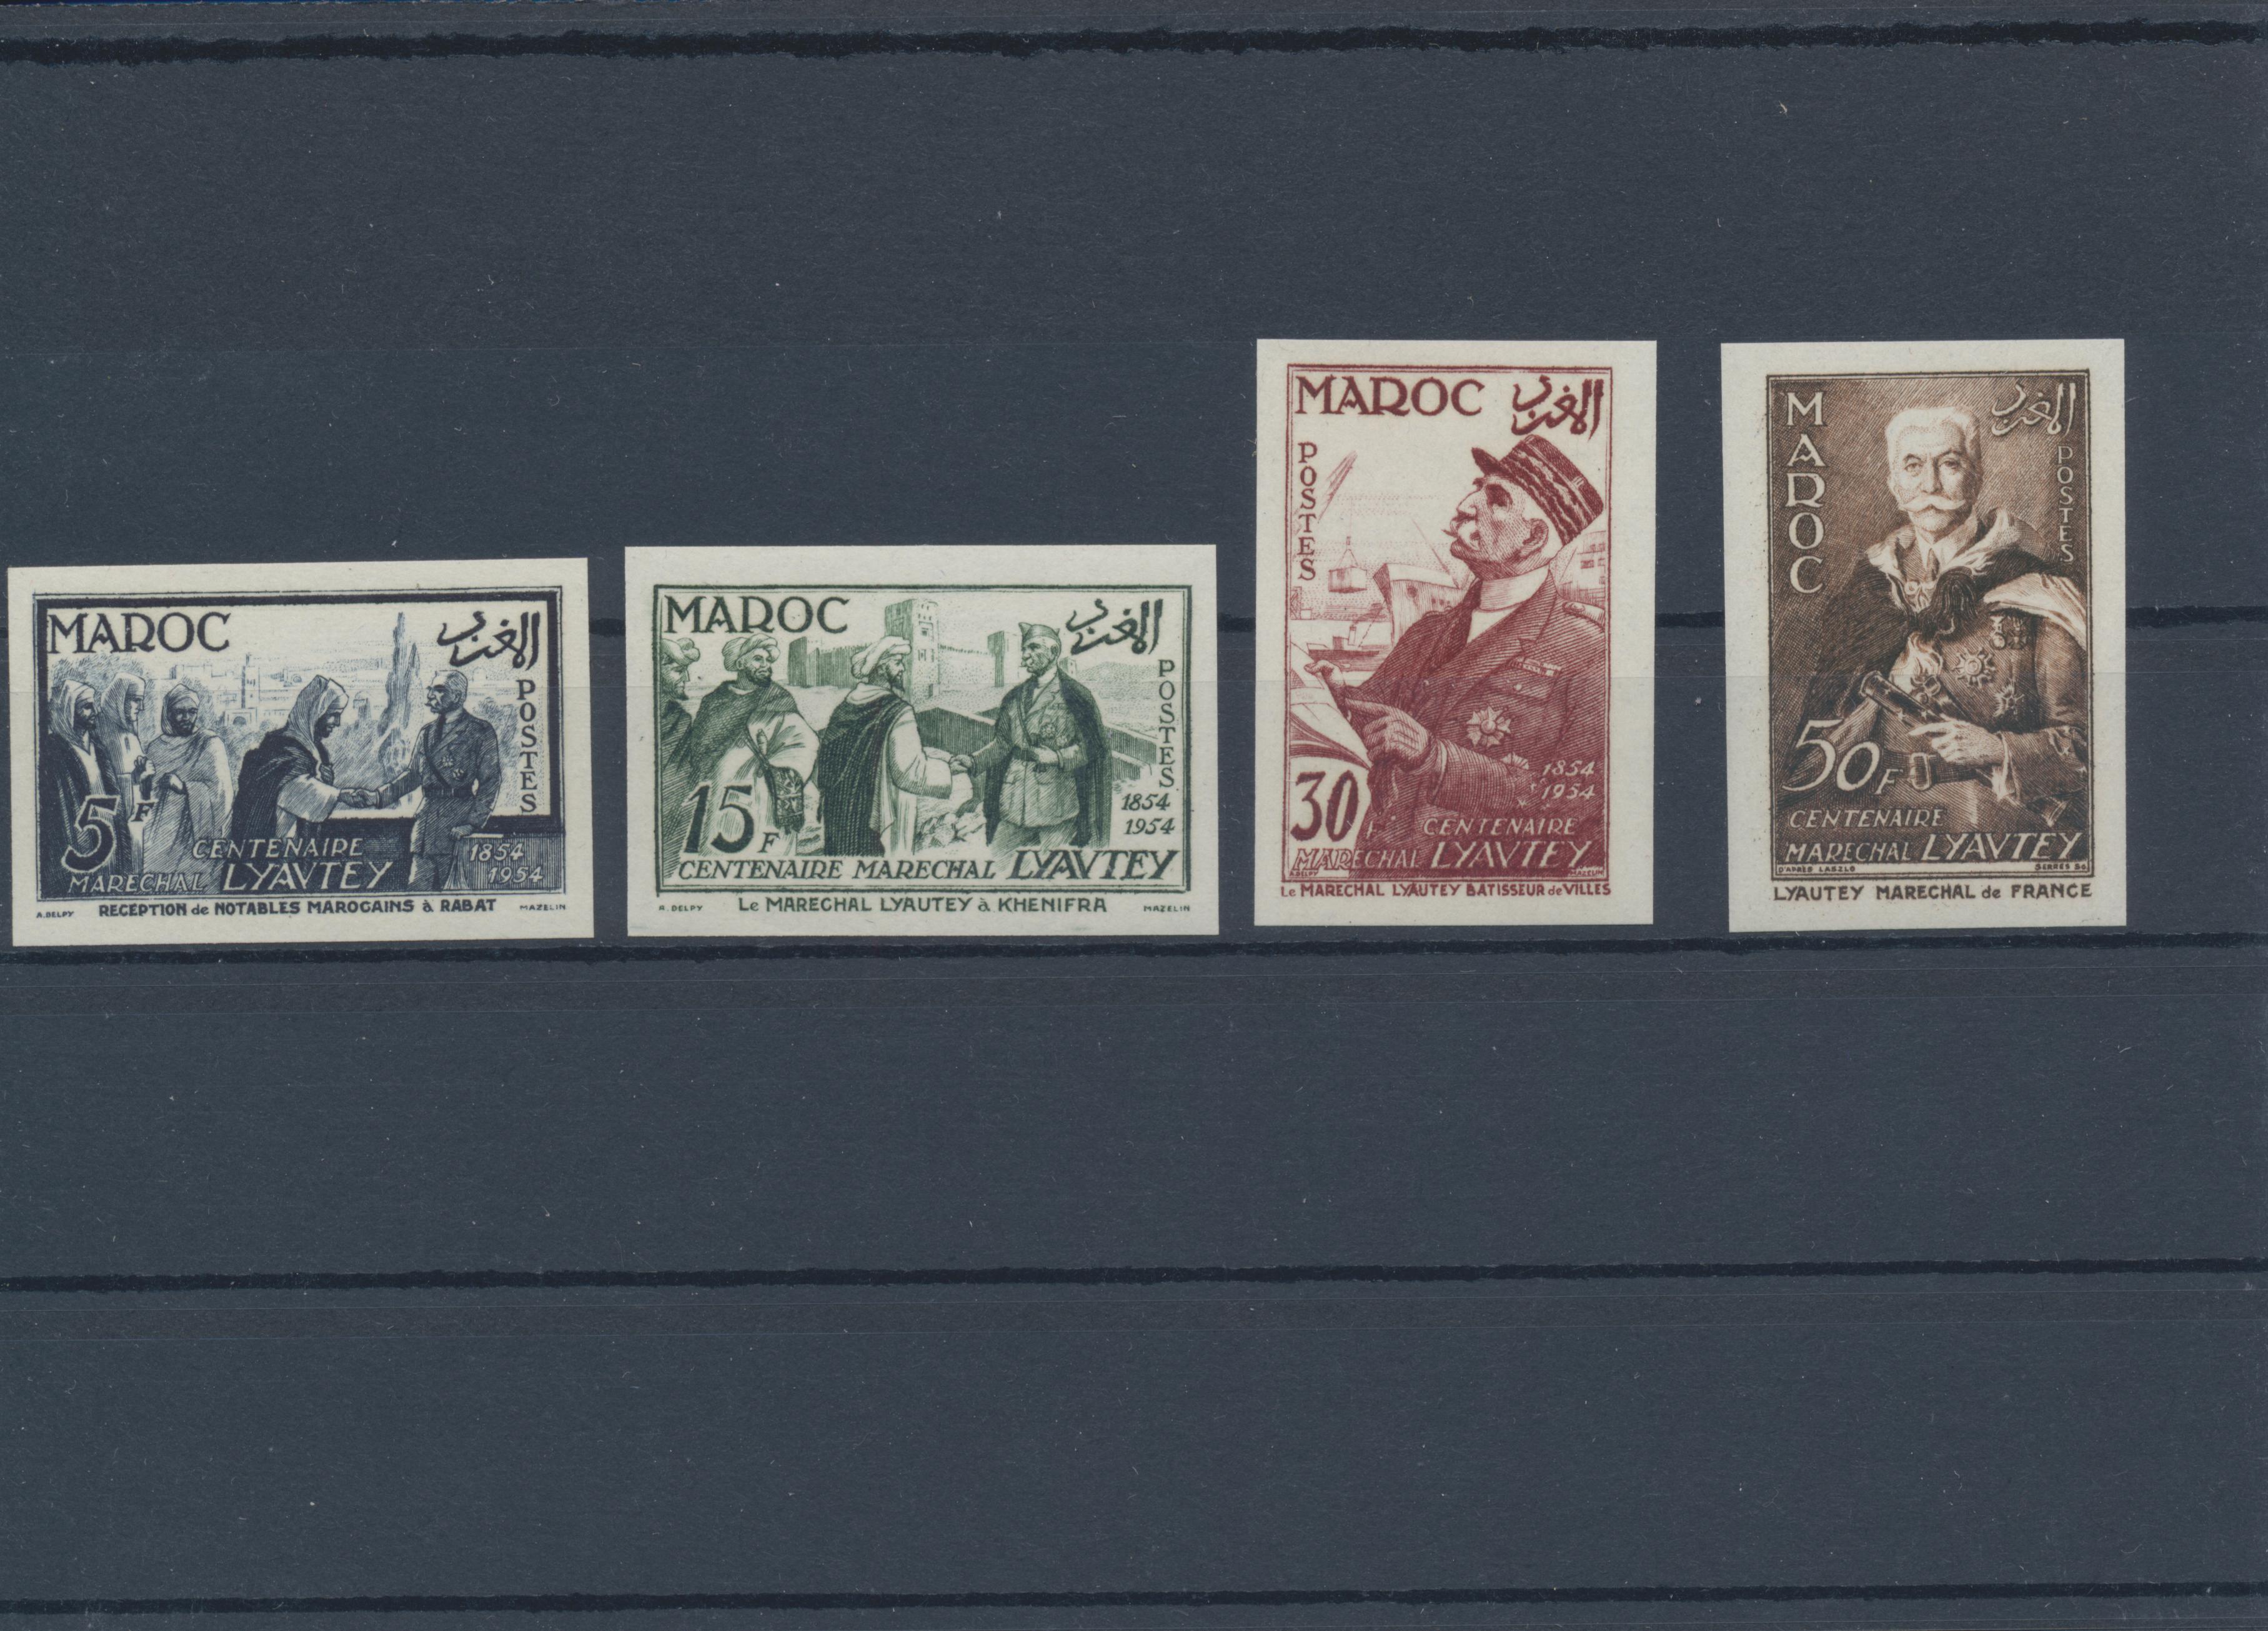 Lot 22024 - nachlässe  -  Auktionshaus Christoph Gärtner GmbH & Co. KG Sale #49 Collections Overseas, Thematics, Europe, Germany/Estates